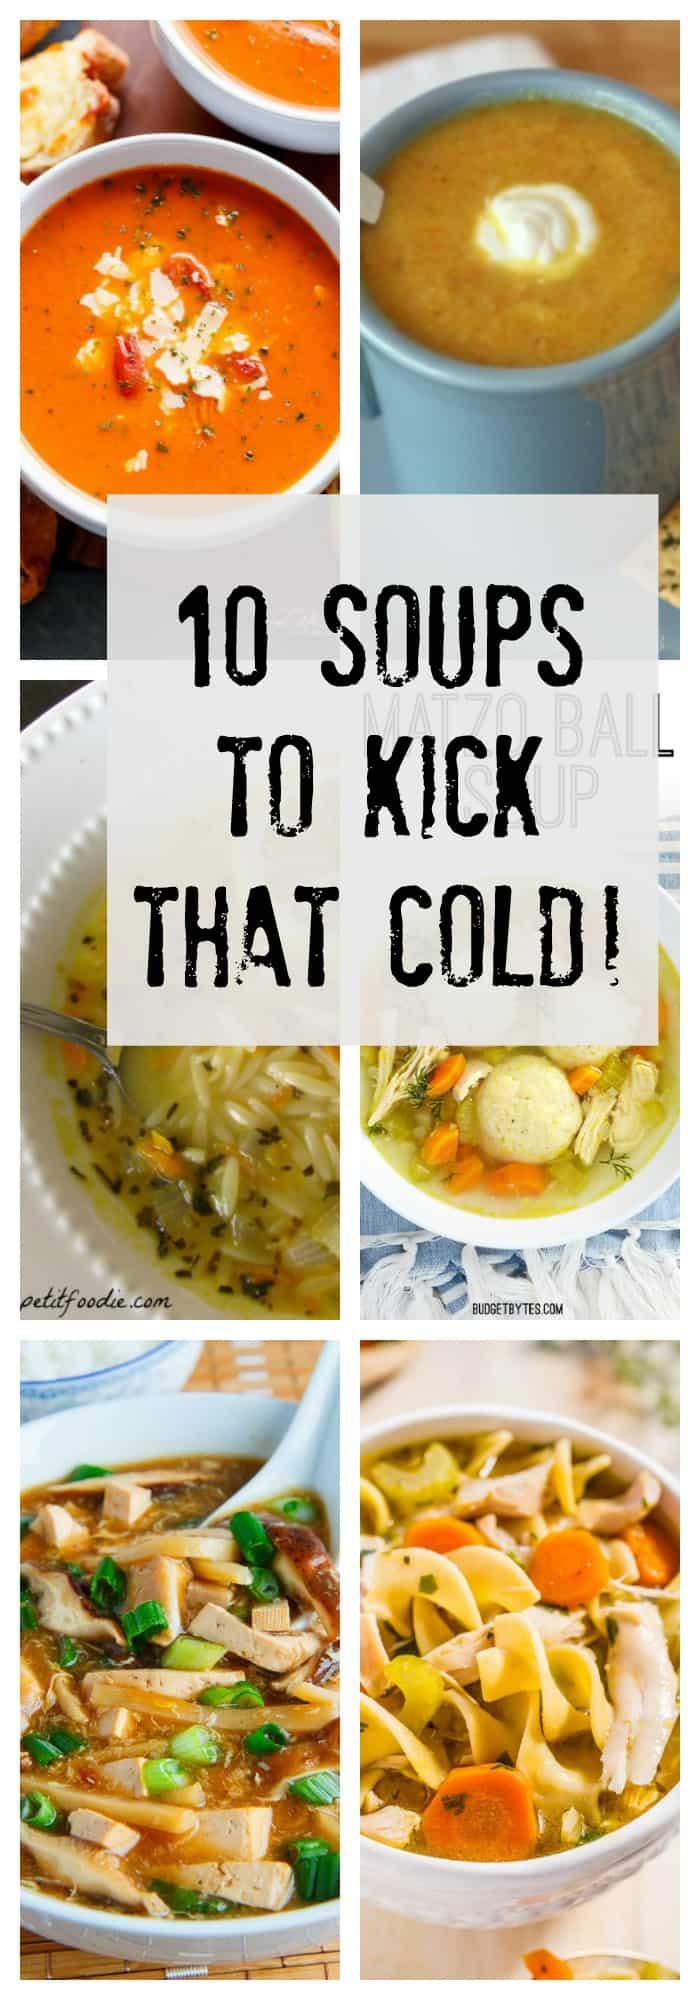 10-soups-to-kick-that-cold-pin